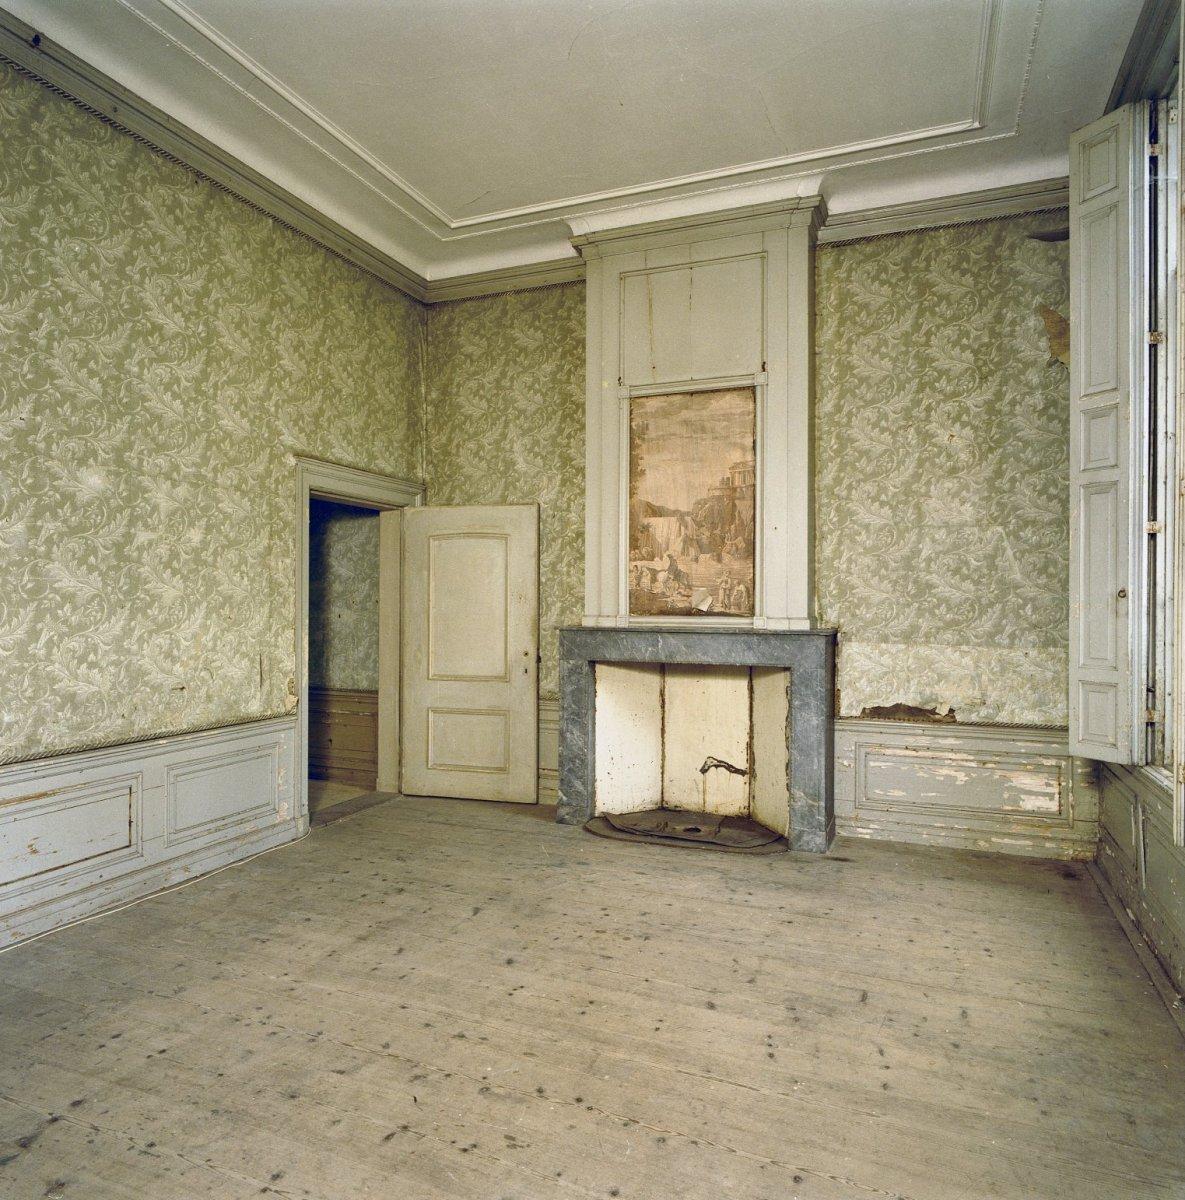 File interieur beneden kamer papierbehangsel for Kamer interieur